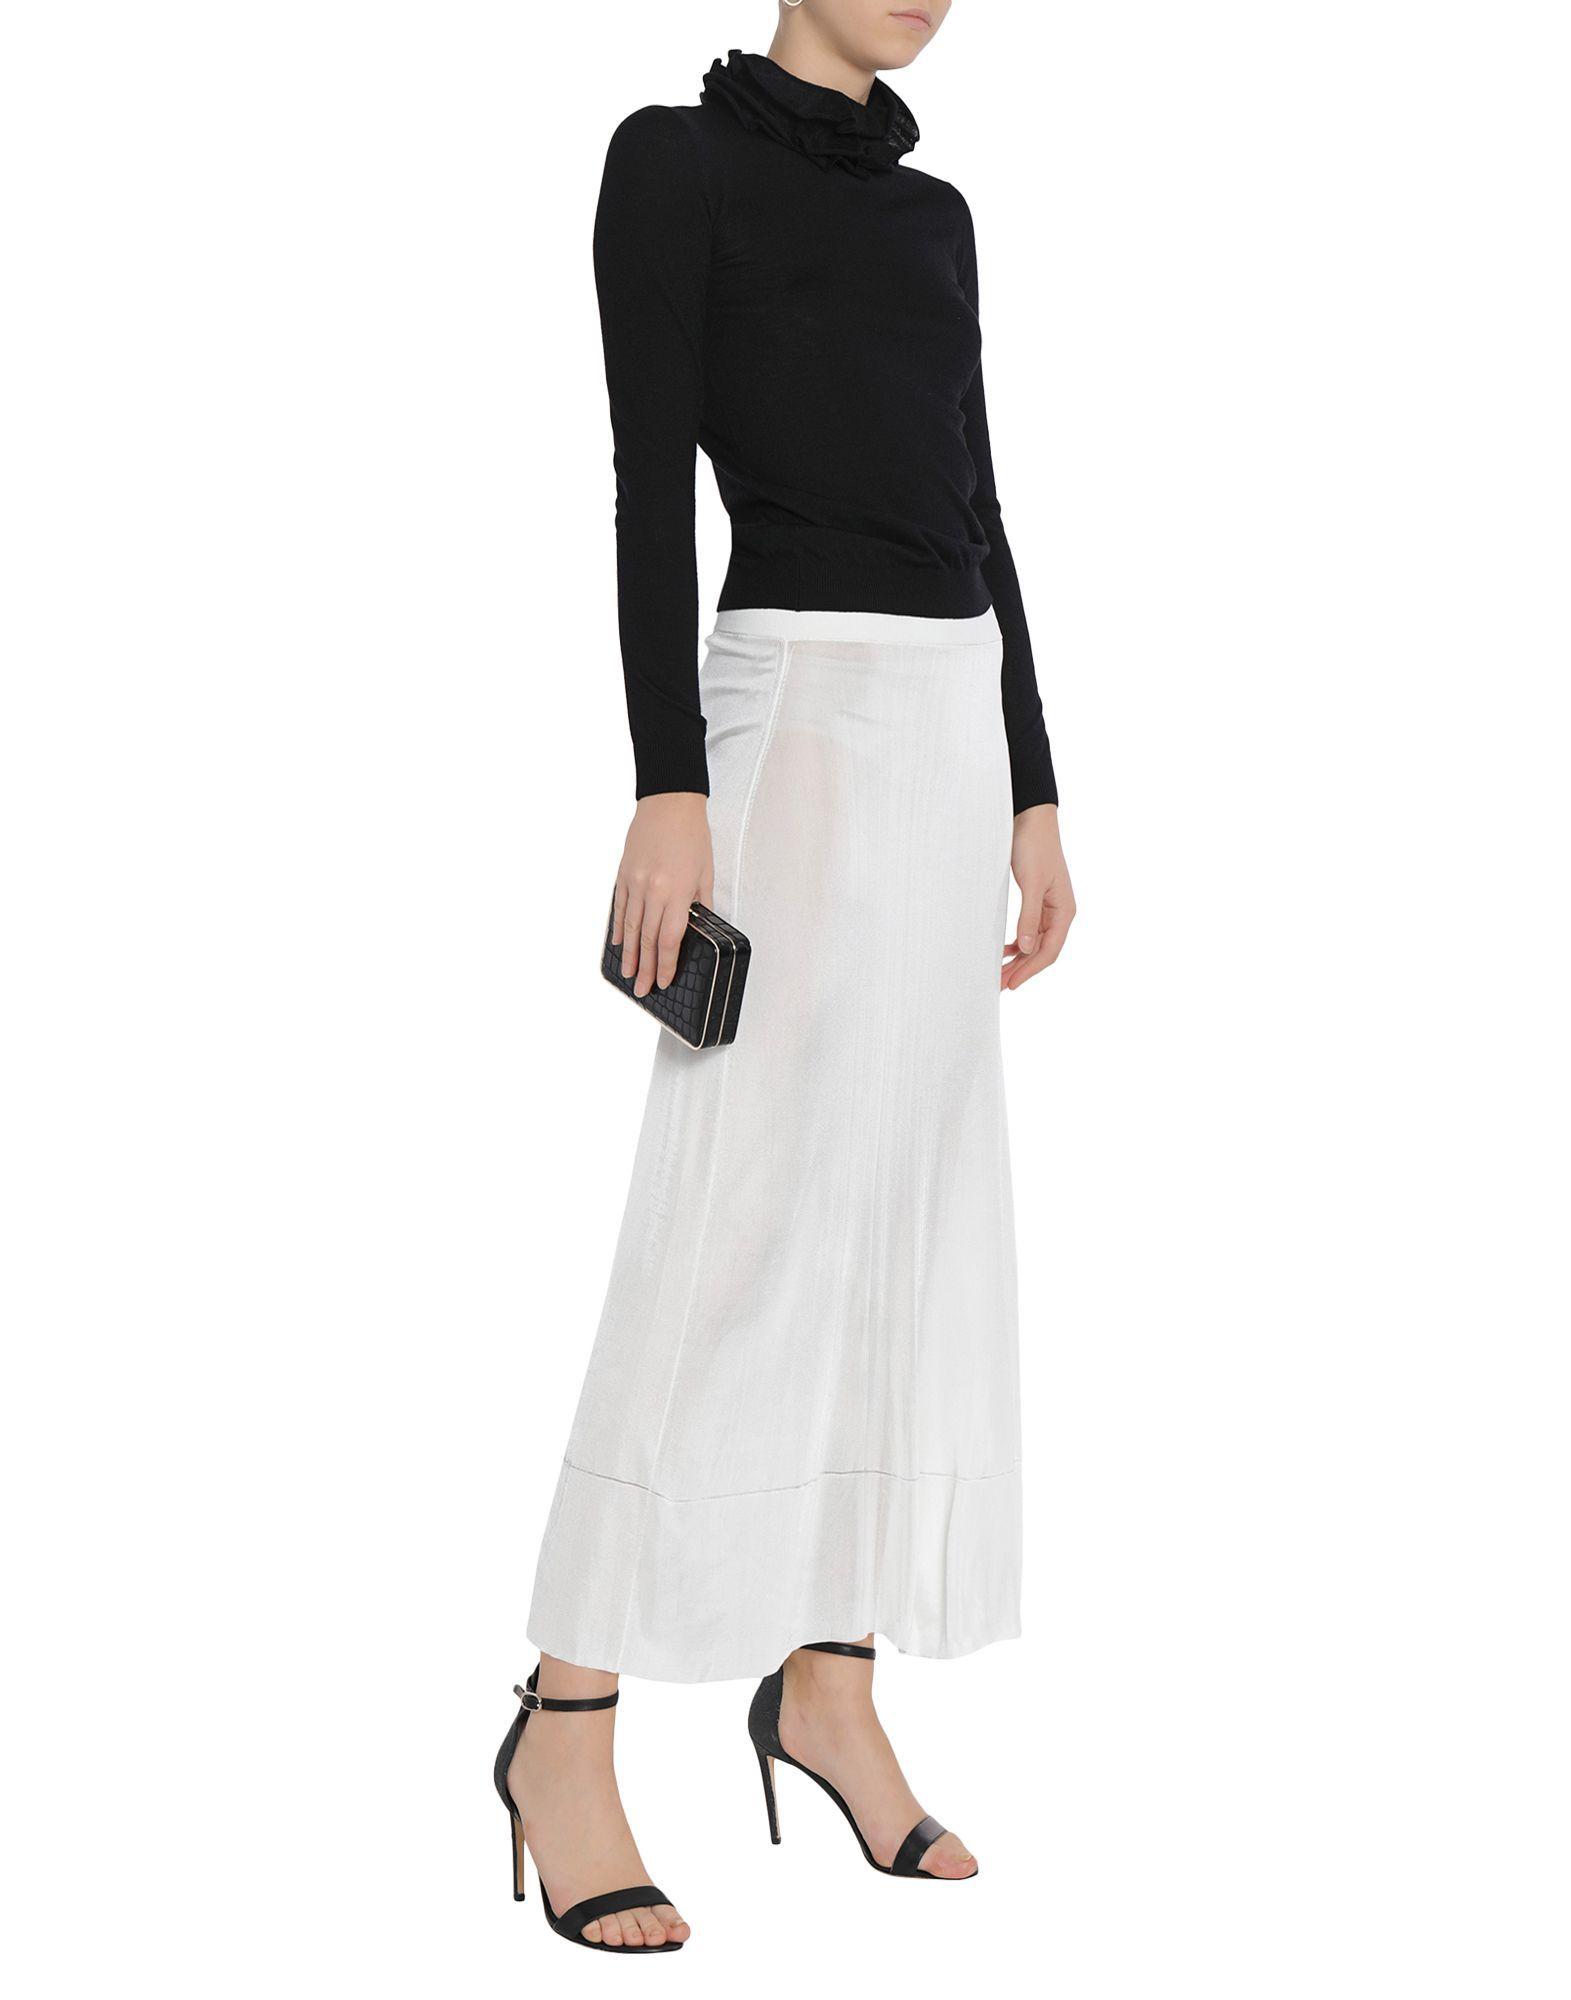 Calvin Klein Collection White Knit Skirt